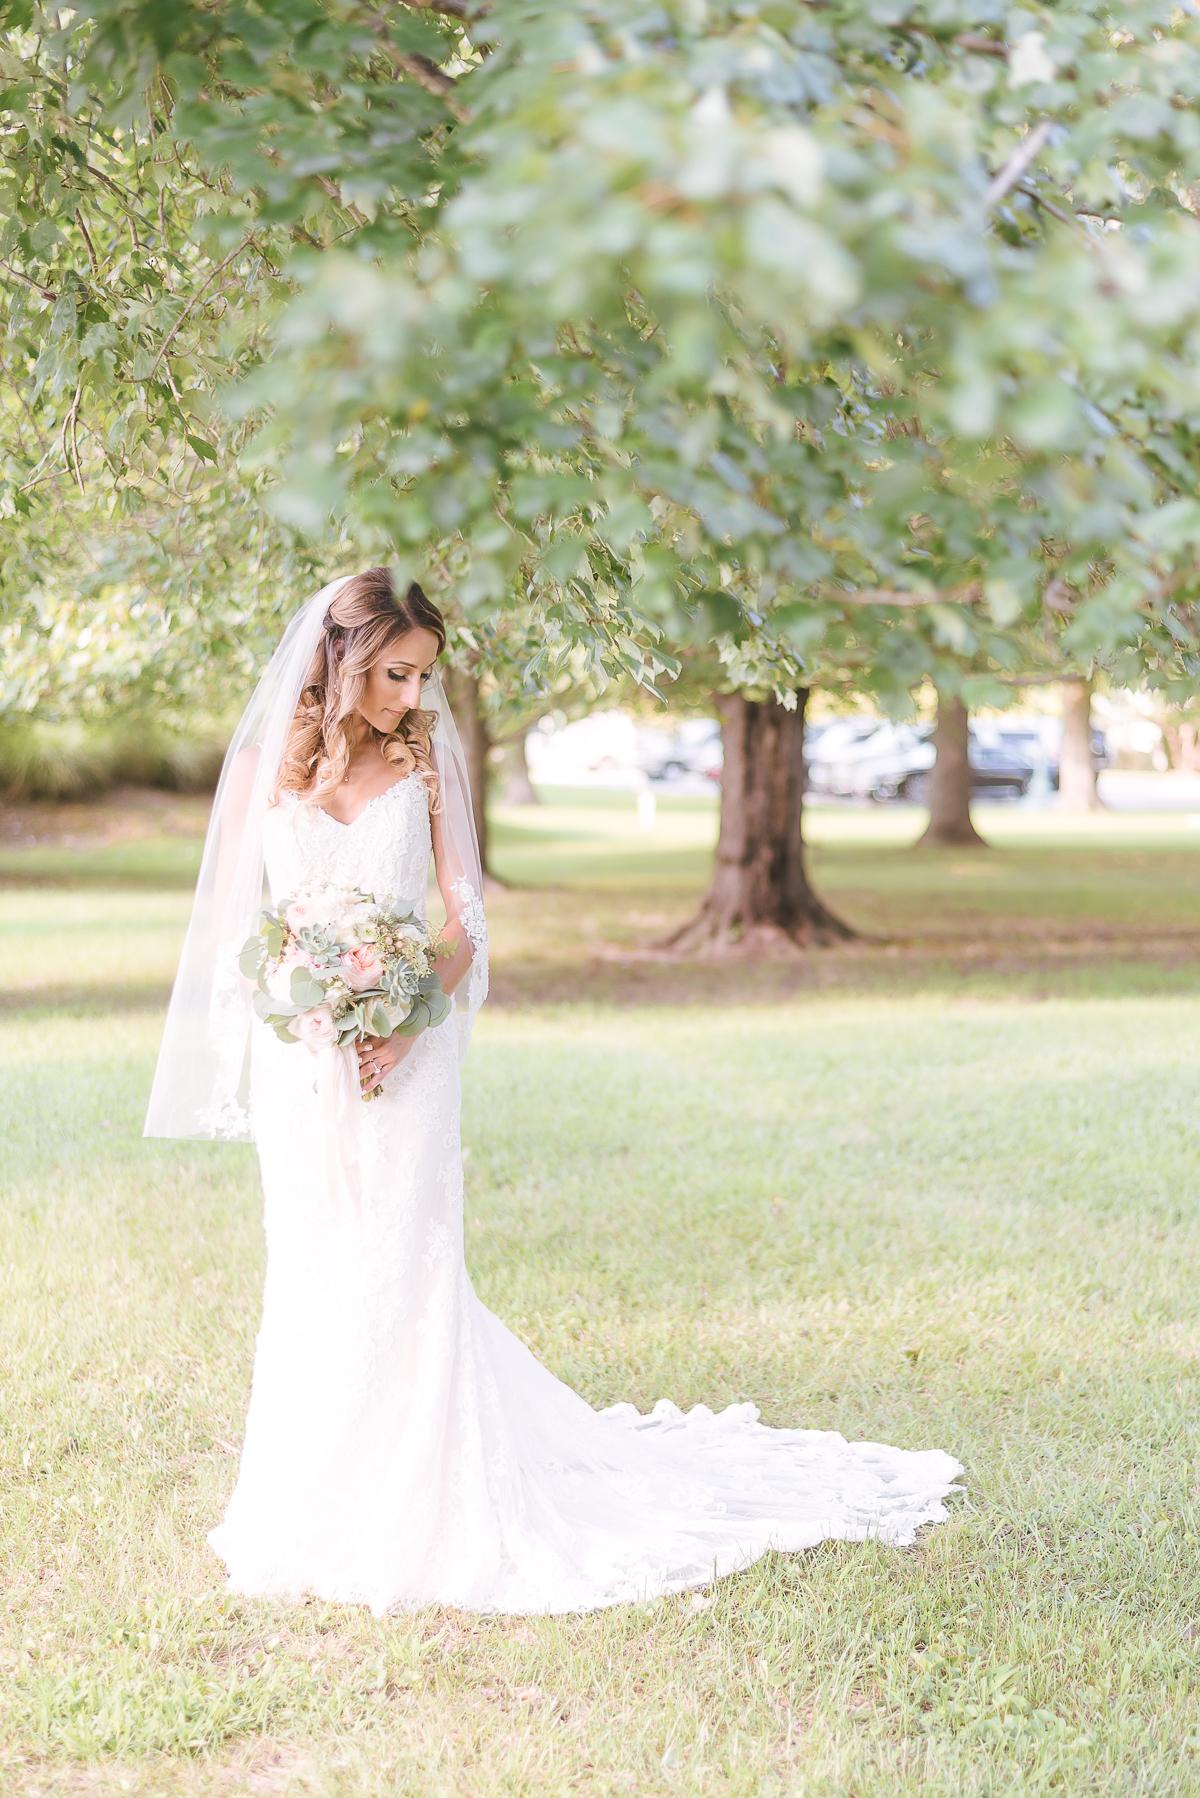 MD-Herrington-on-the-Bay-Wedding-Bridal-Portrait-36.jpg